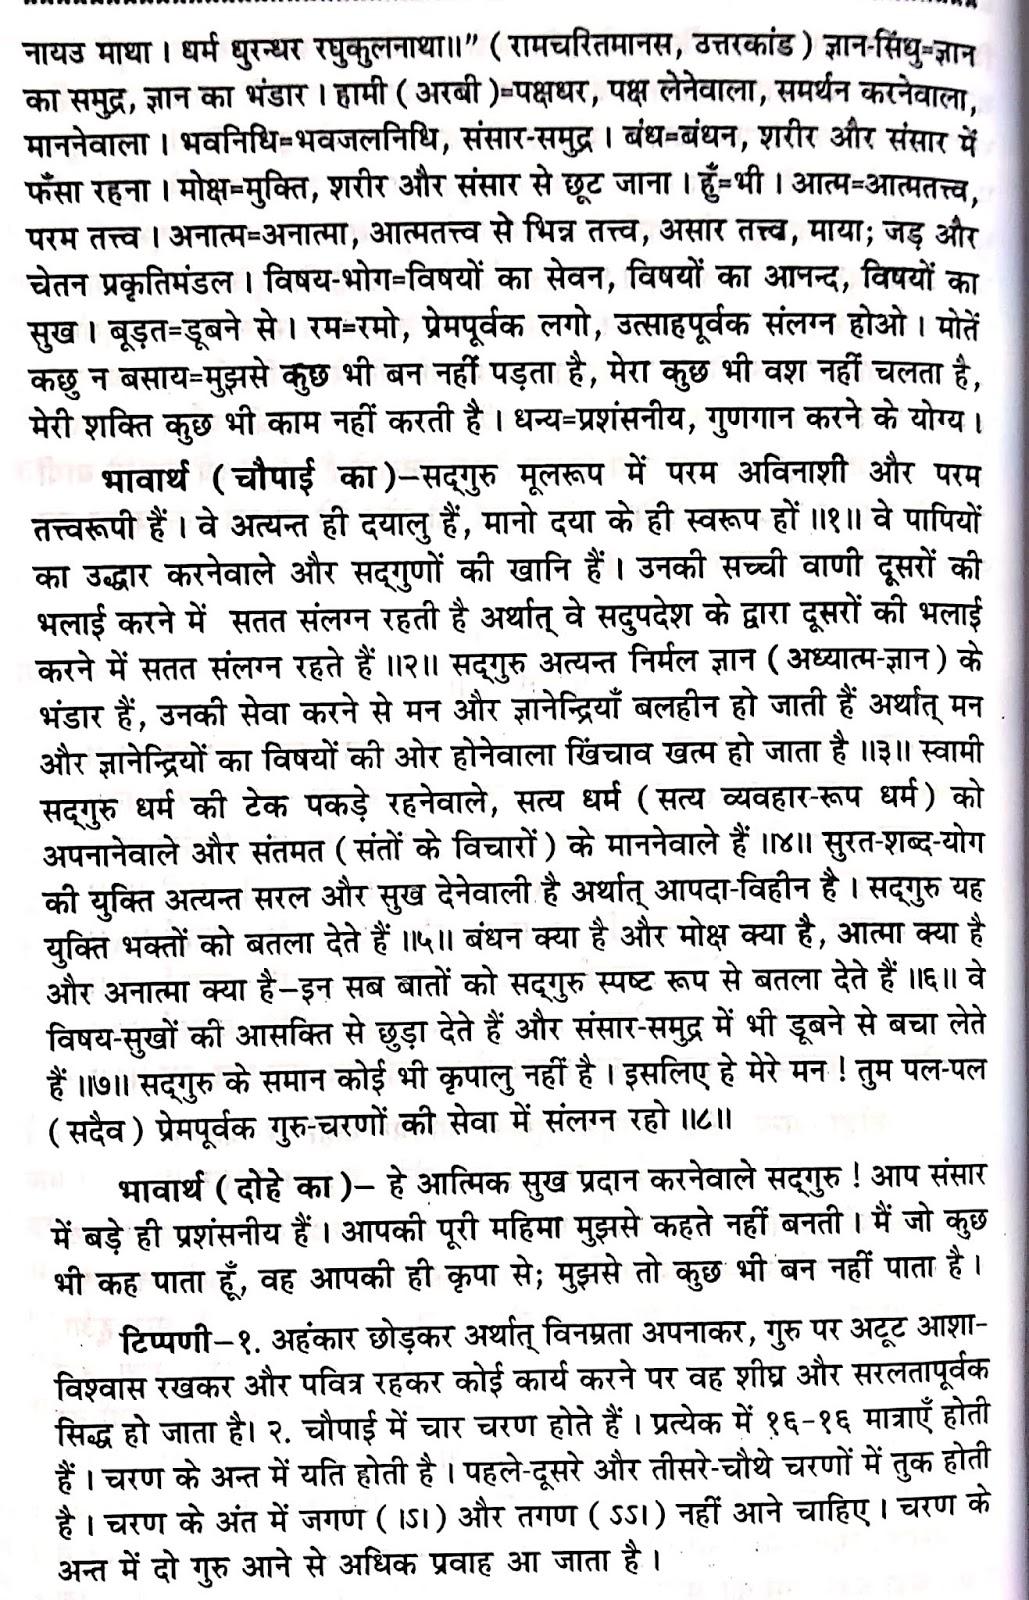 "P100, Benefits of making a guru ""सतगुरु सत परमारथ रूपा।,..."" महर्षि मेंहीं पदावली अर्थ सहित। पदावली भजन नंबर 100 का भावार्थ टिप्पणी।"